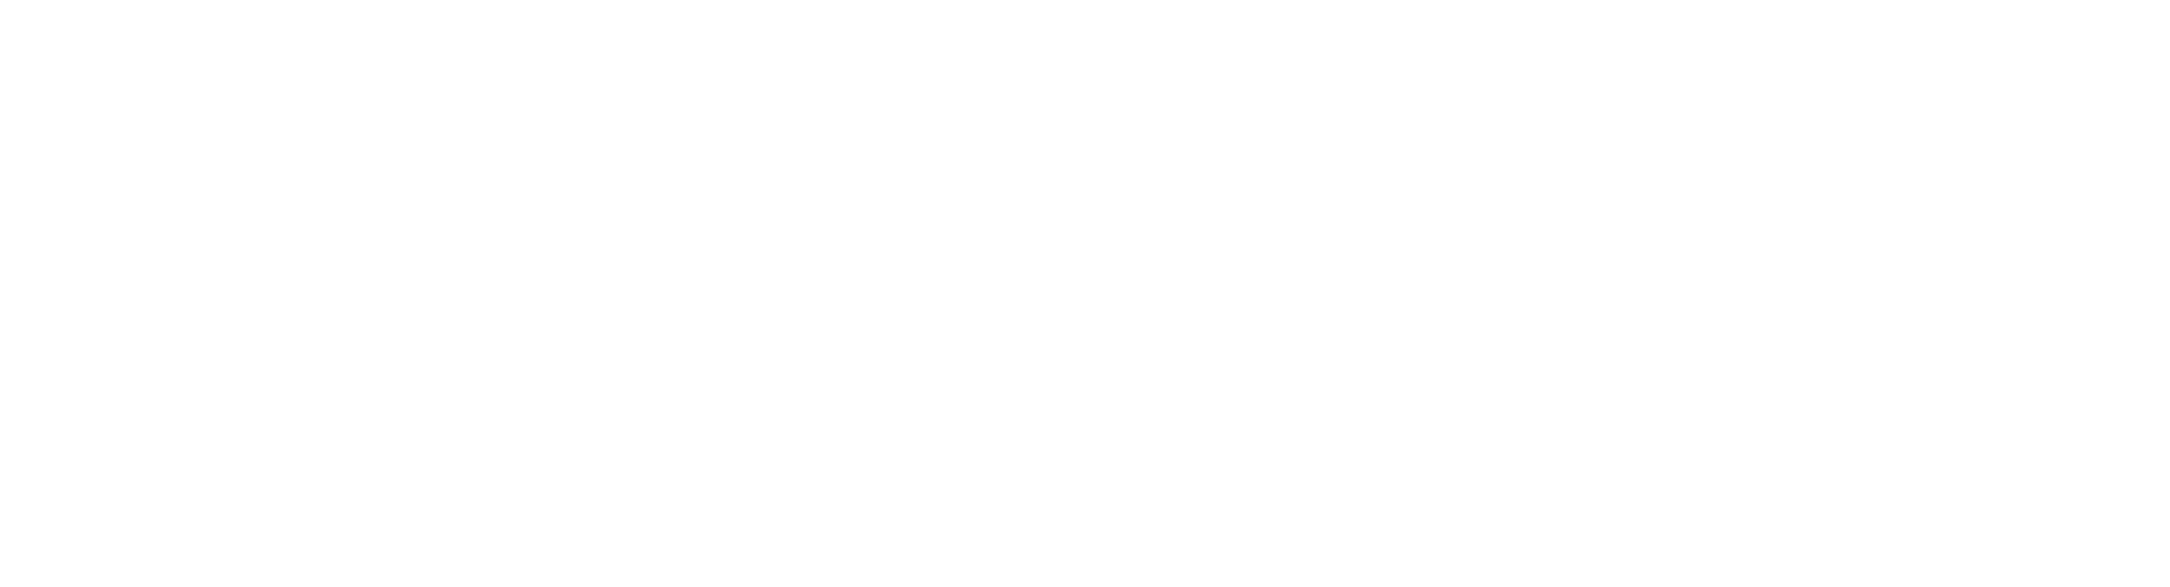 2019 Advanced eDiscovery Institute